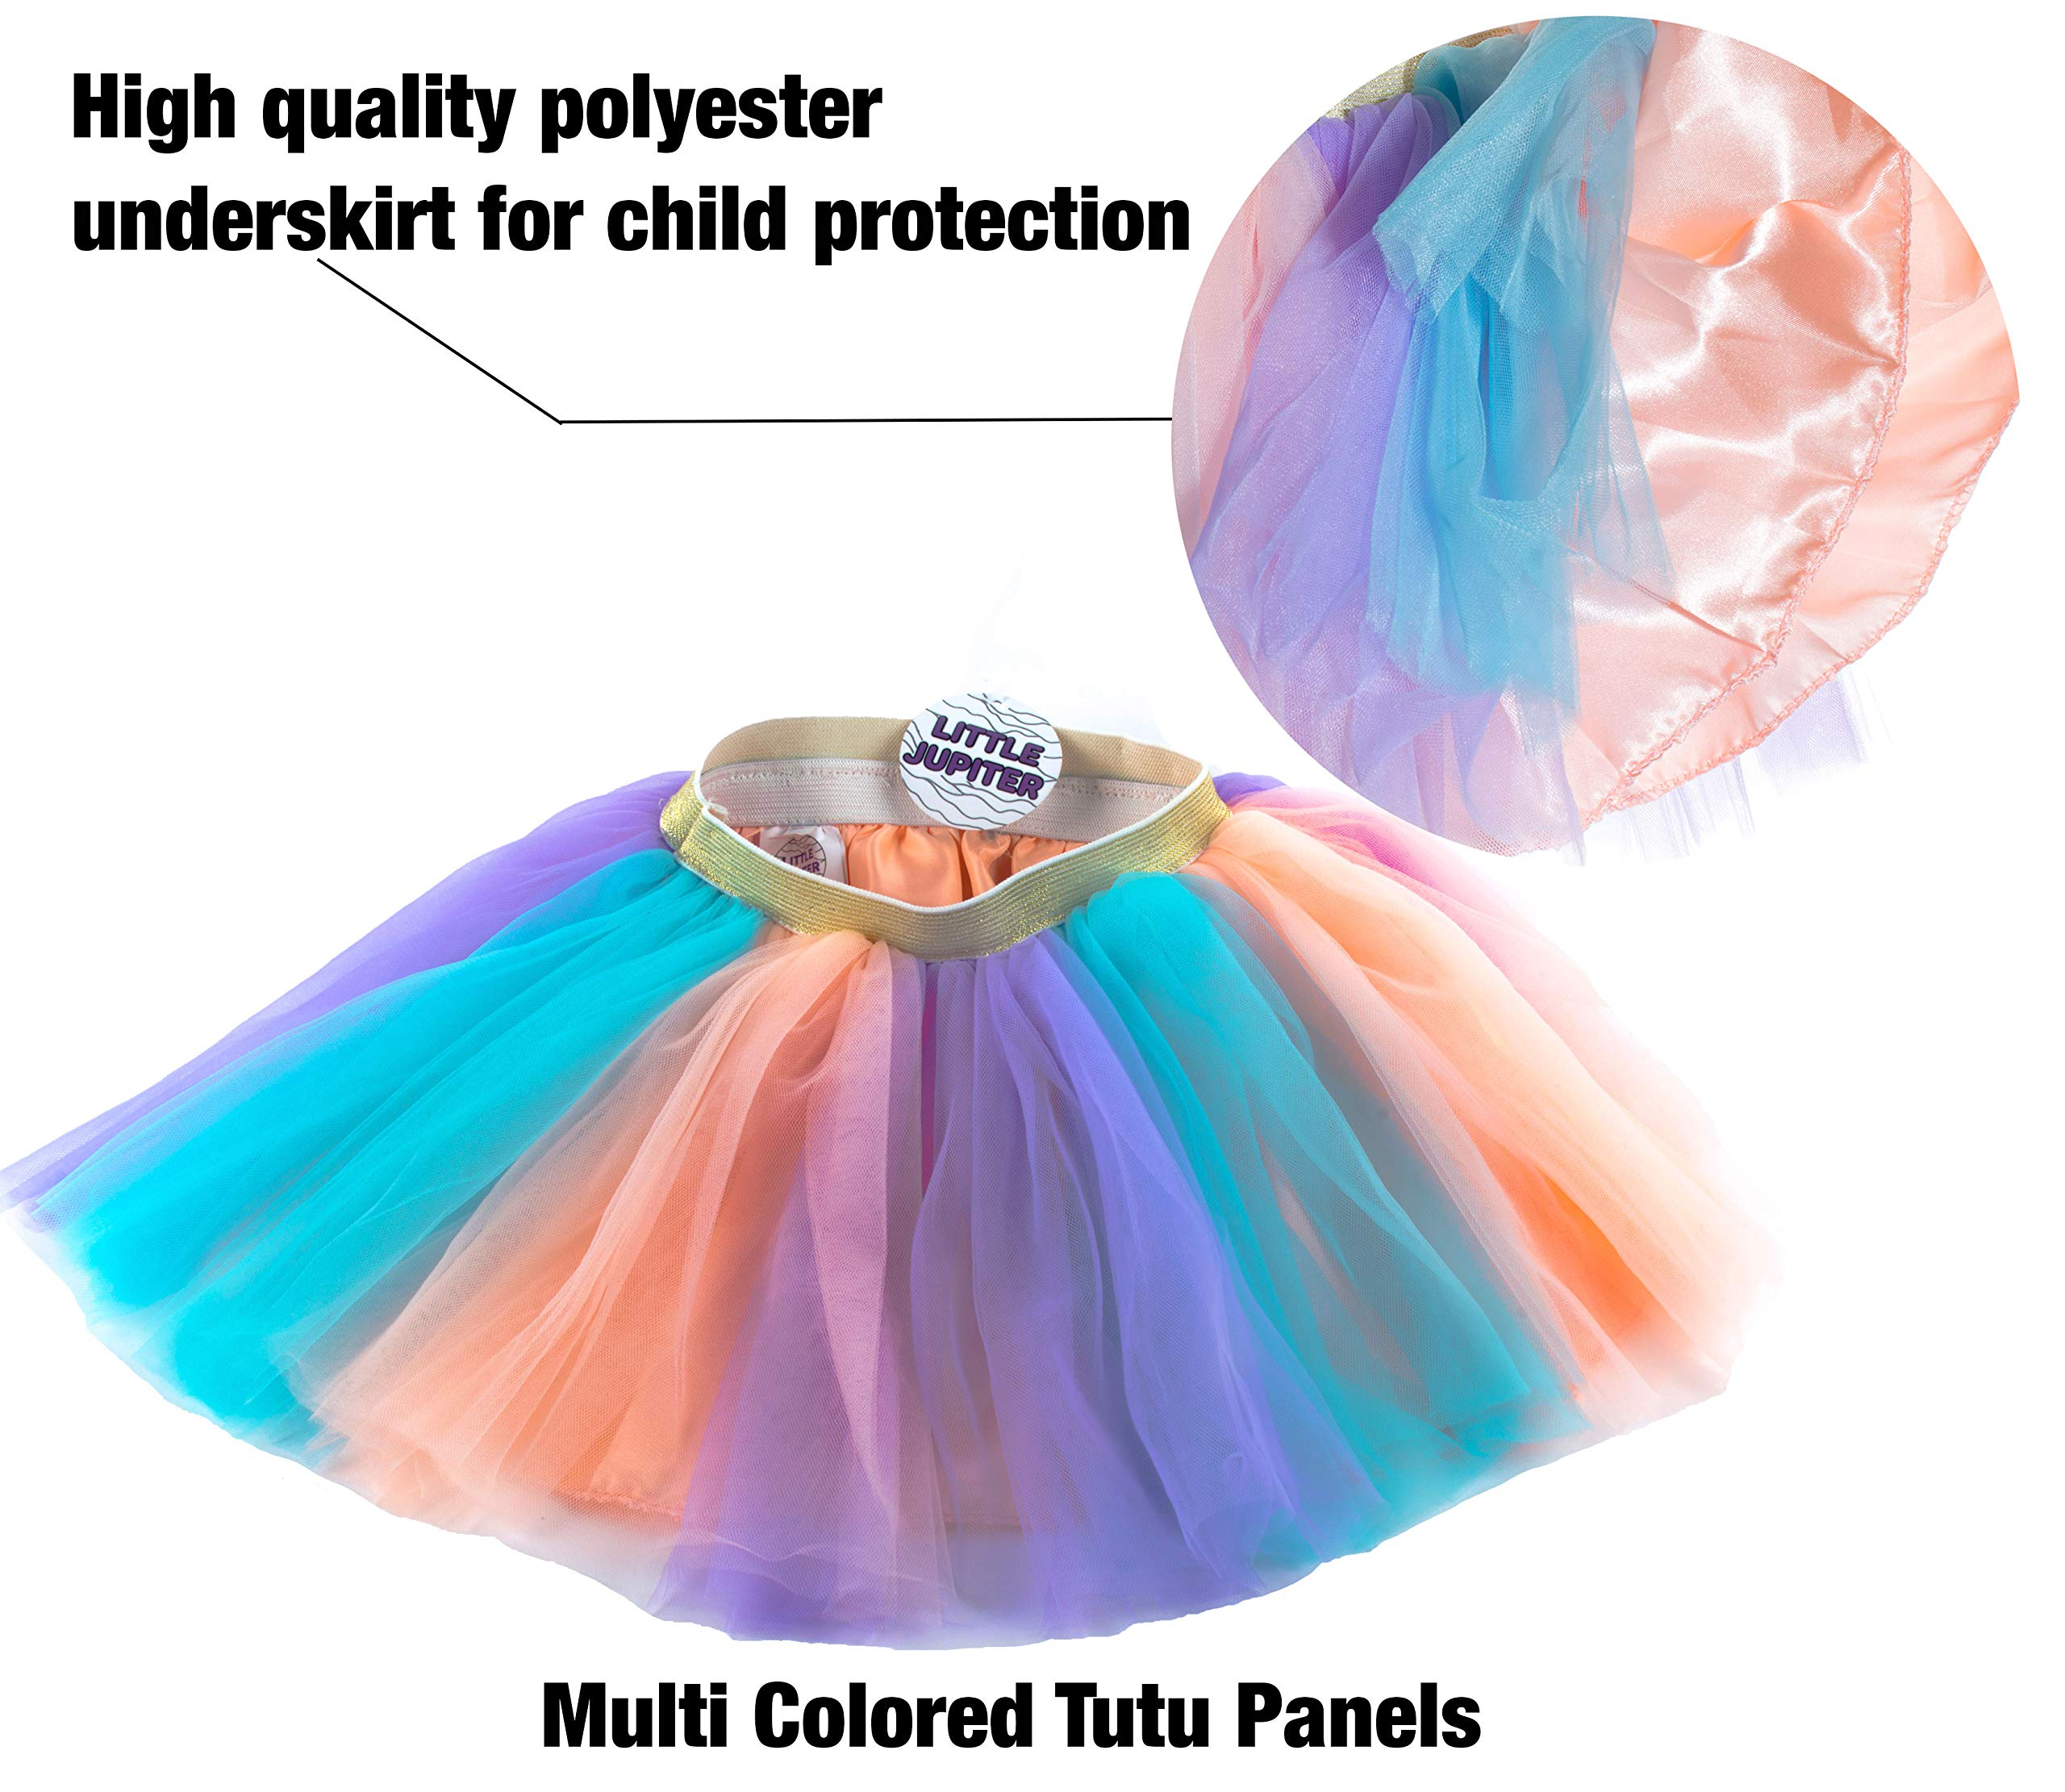 Little Jupiter Premium Girls Rainbow Unicorn Tutu Set 4PC Layered Dress for Age 2-8 Years Costume Unicorn Party 5